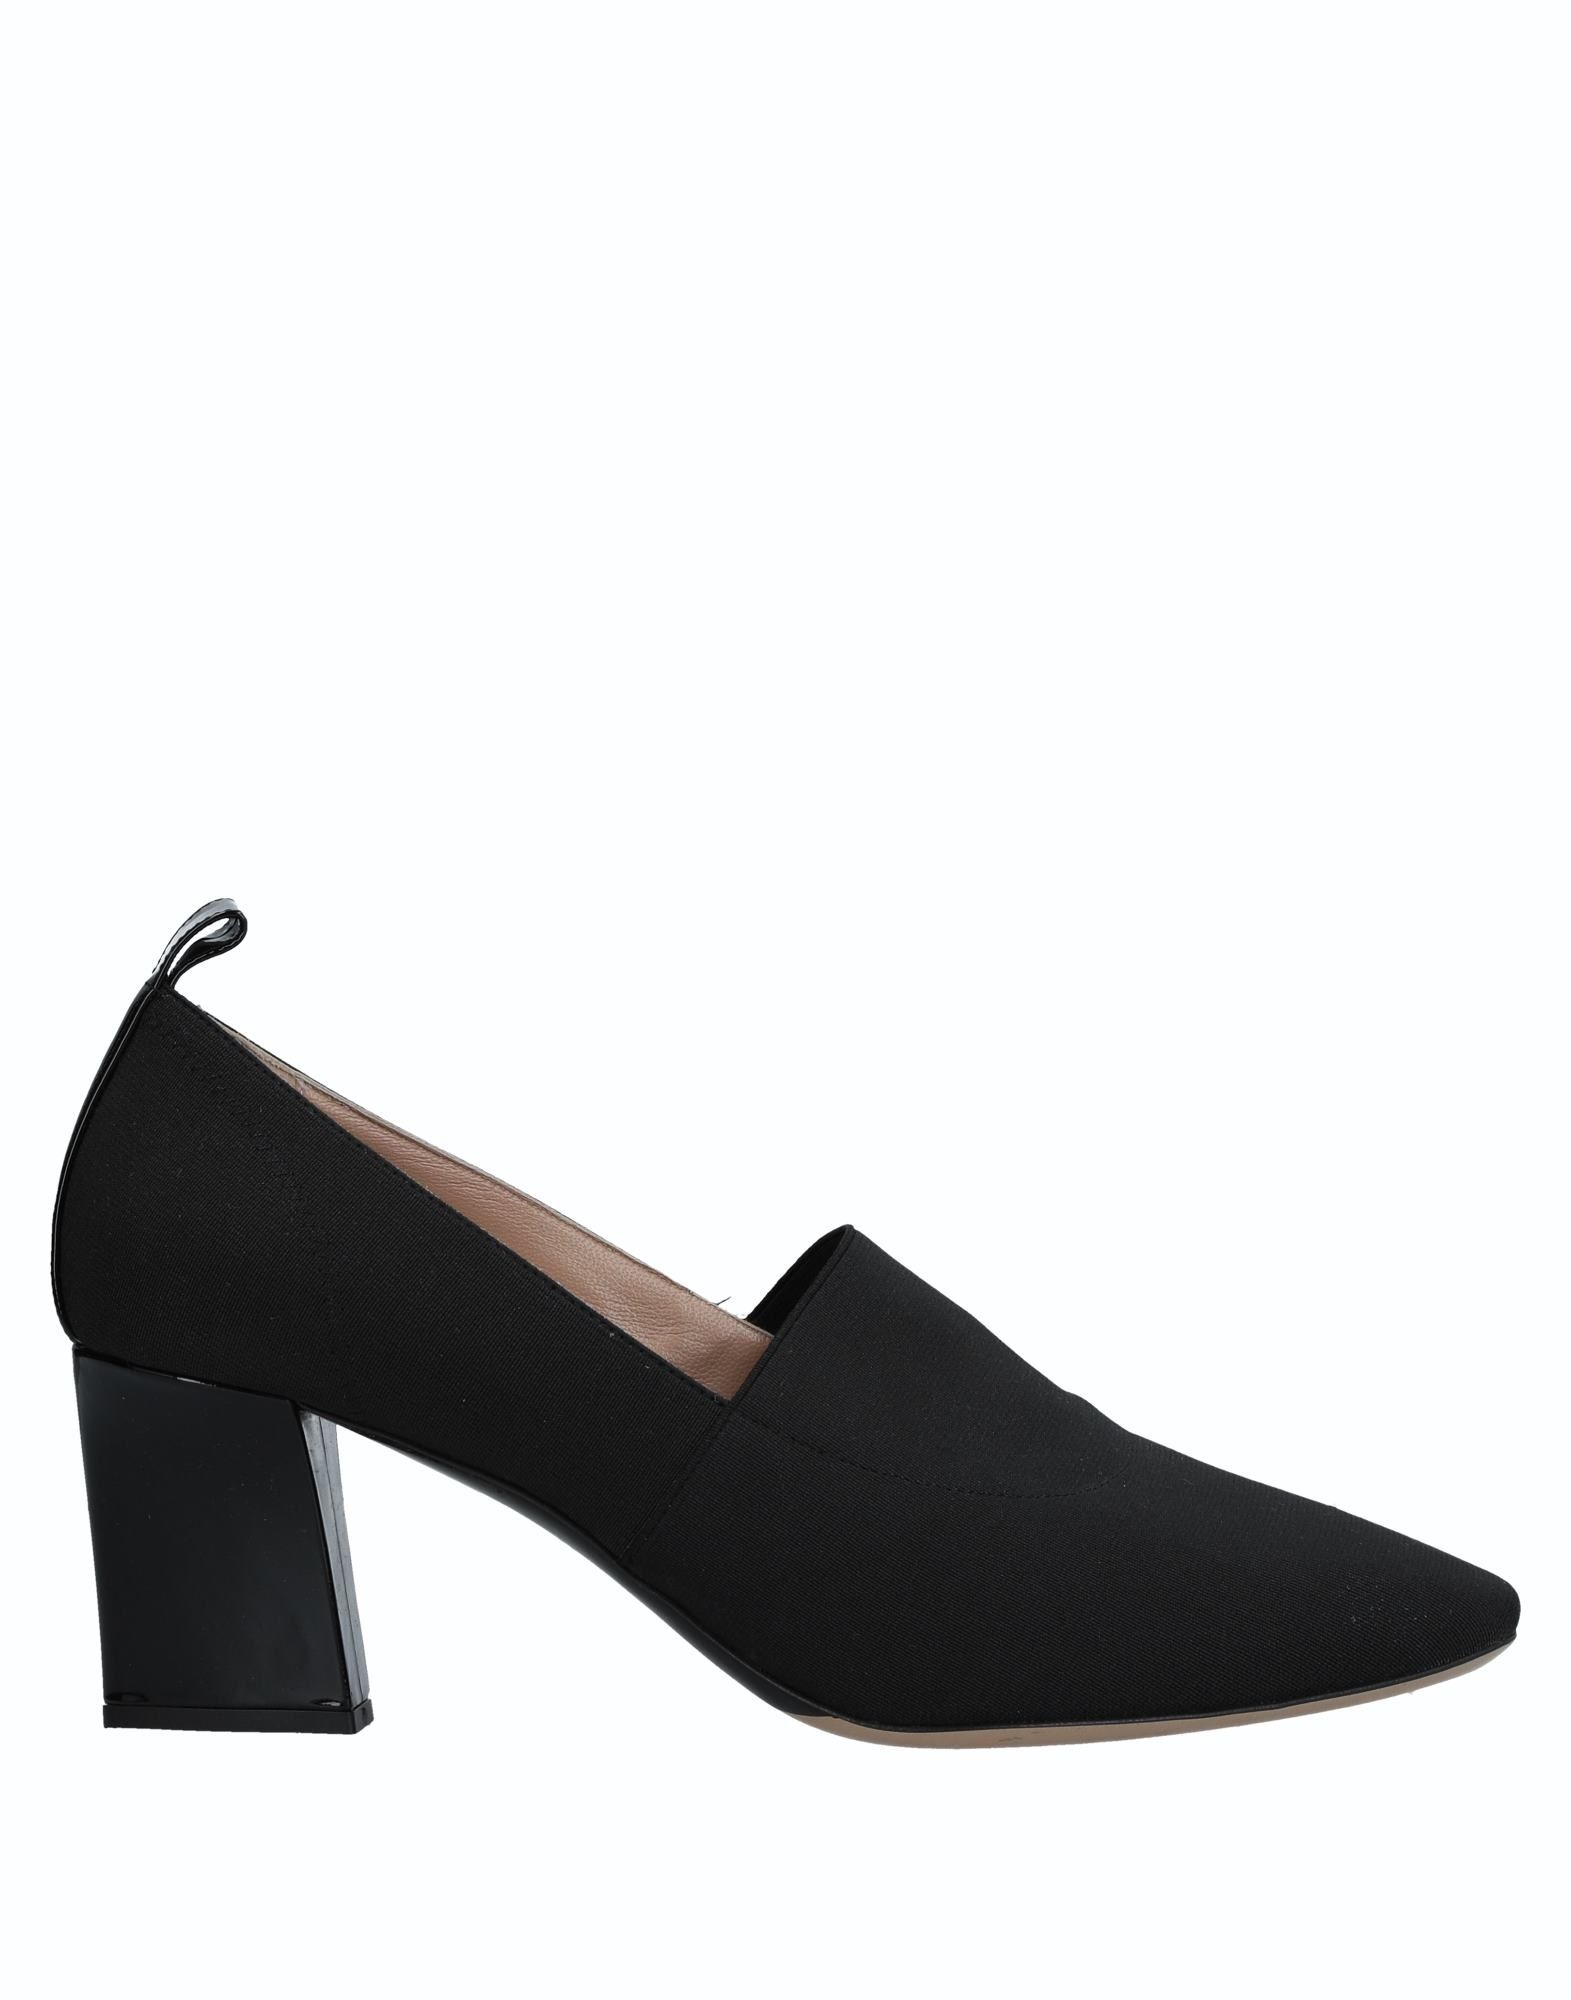 Armani Collezioni Mokassins Damen  11524015ULGut aussehende strapazierfähige Schuhe